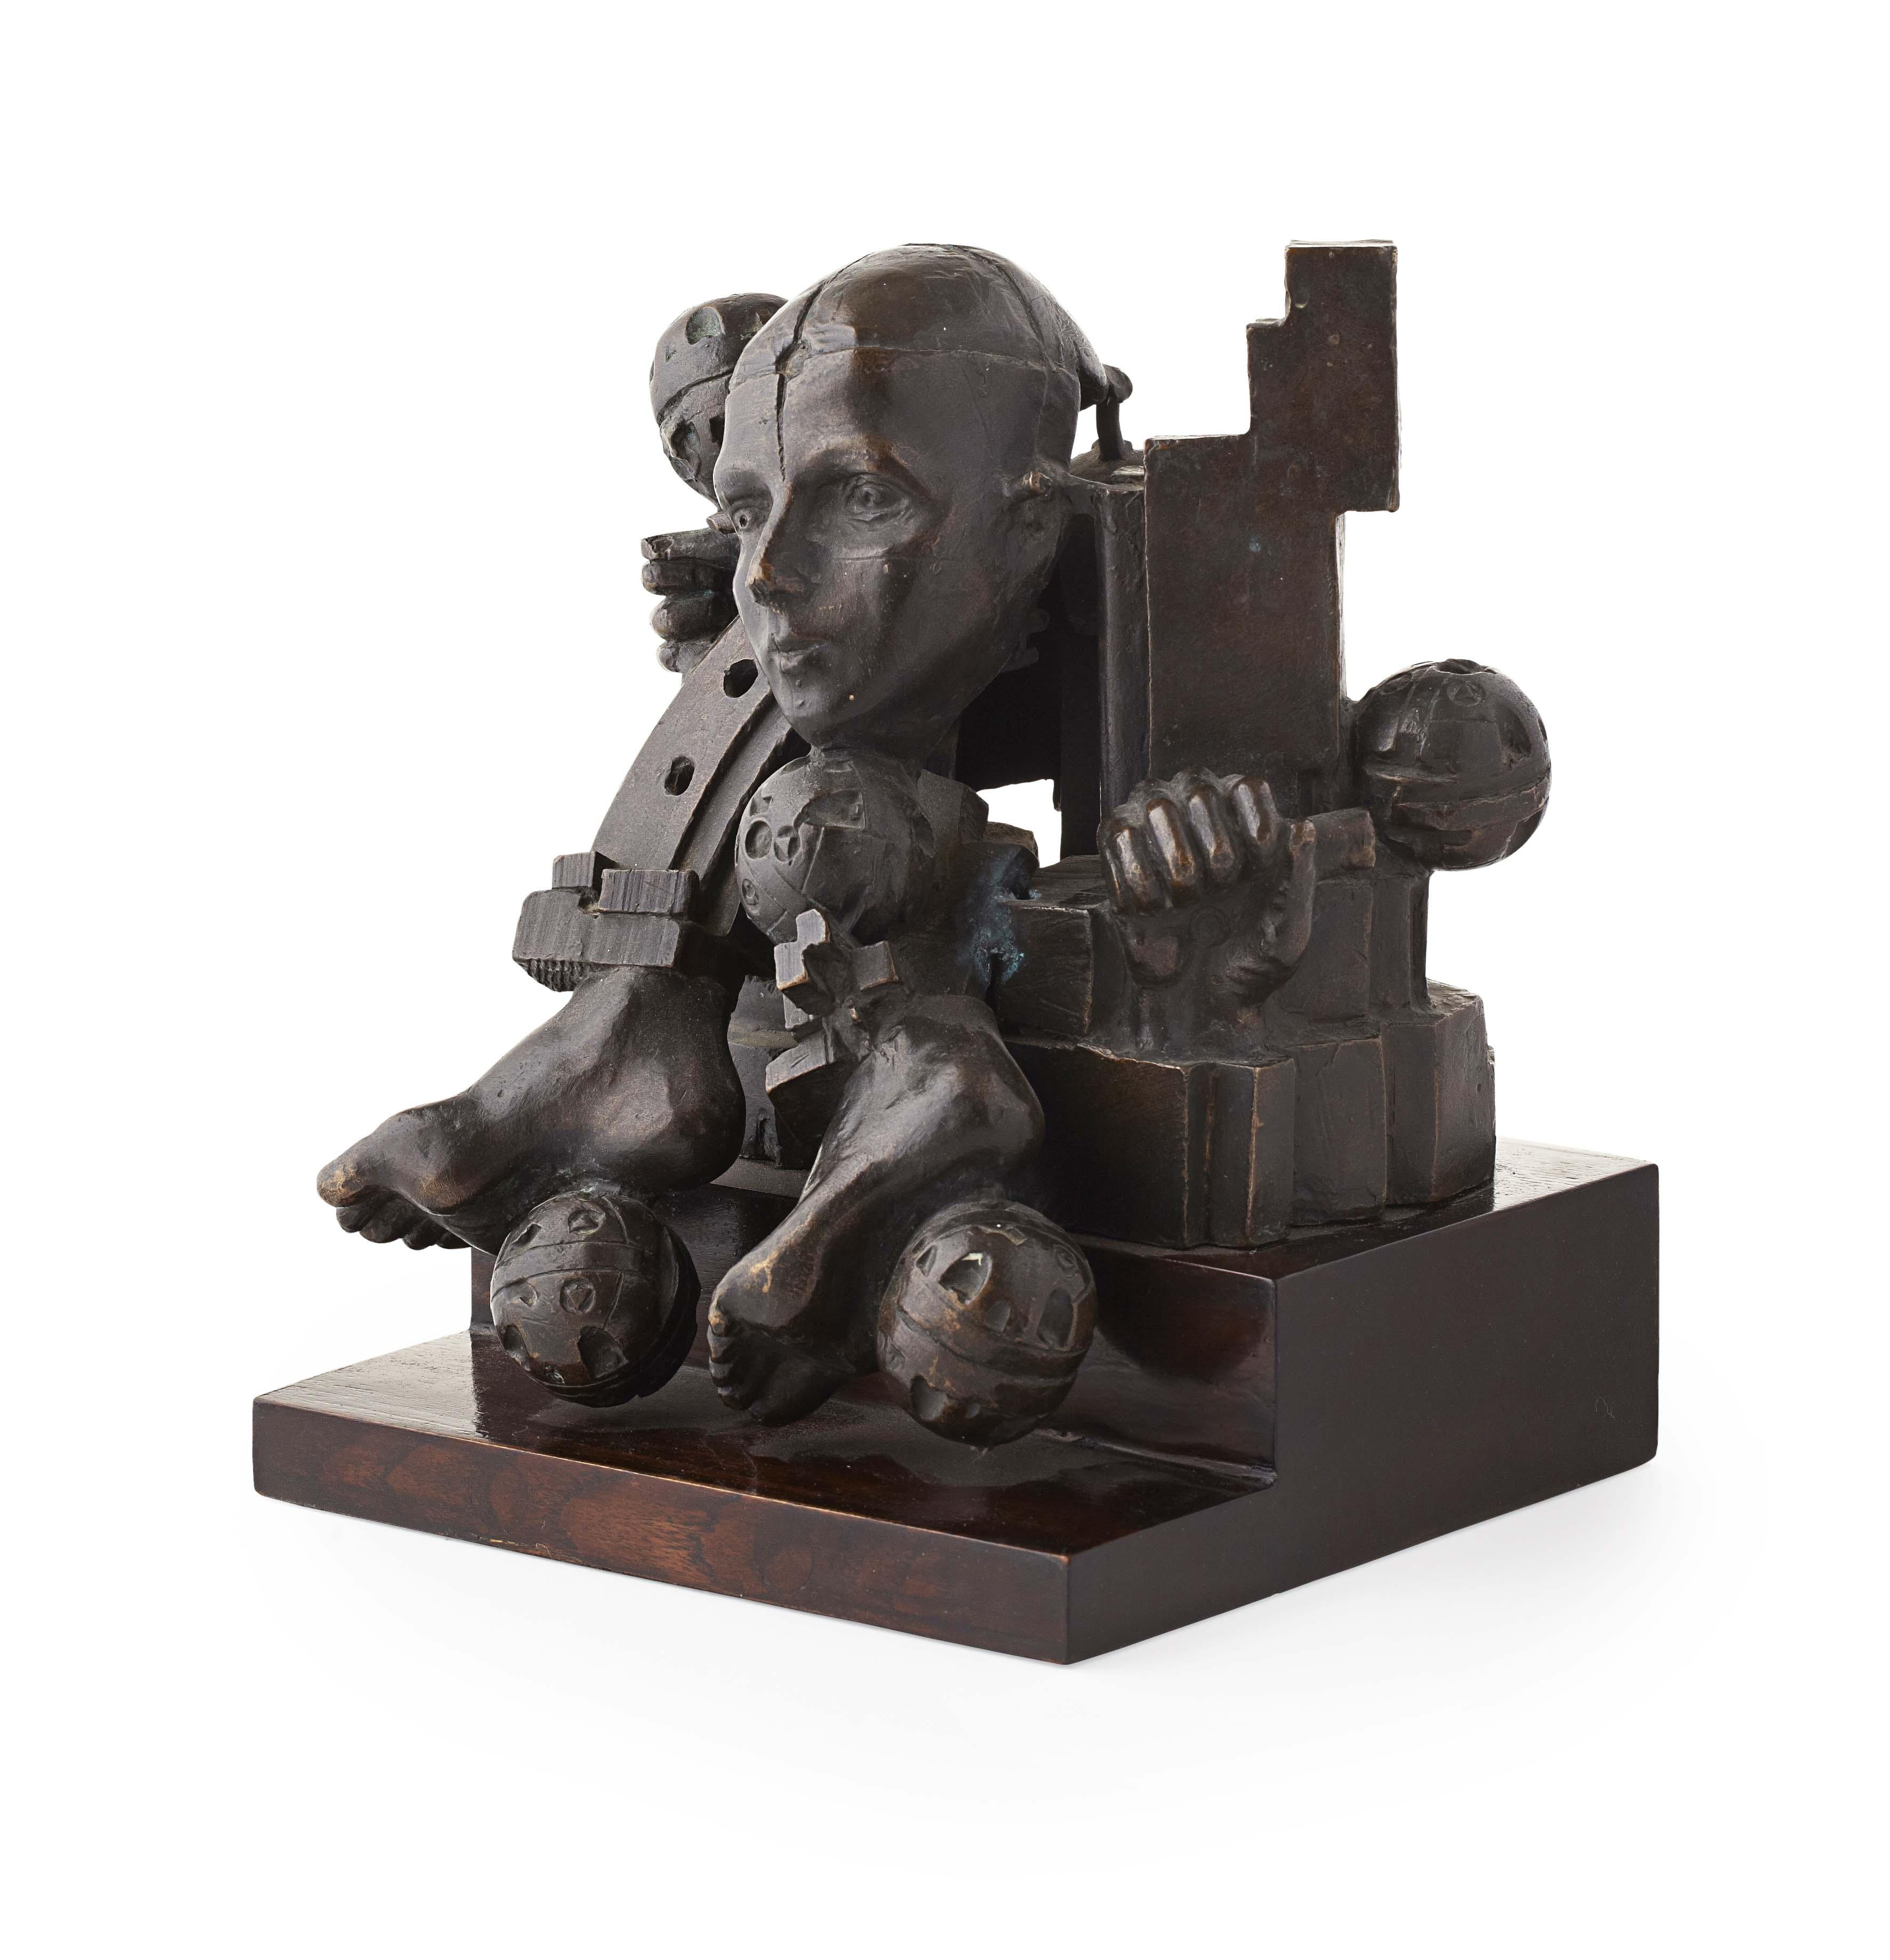 Sir Eduardo Paolozzi | Maquette for Great Ormond Street